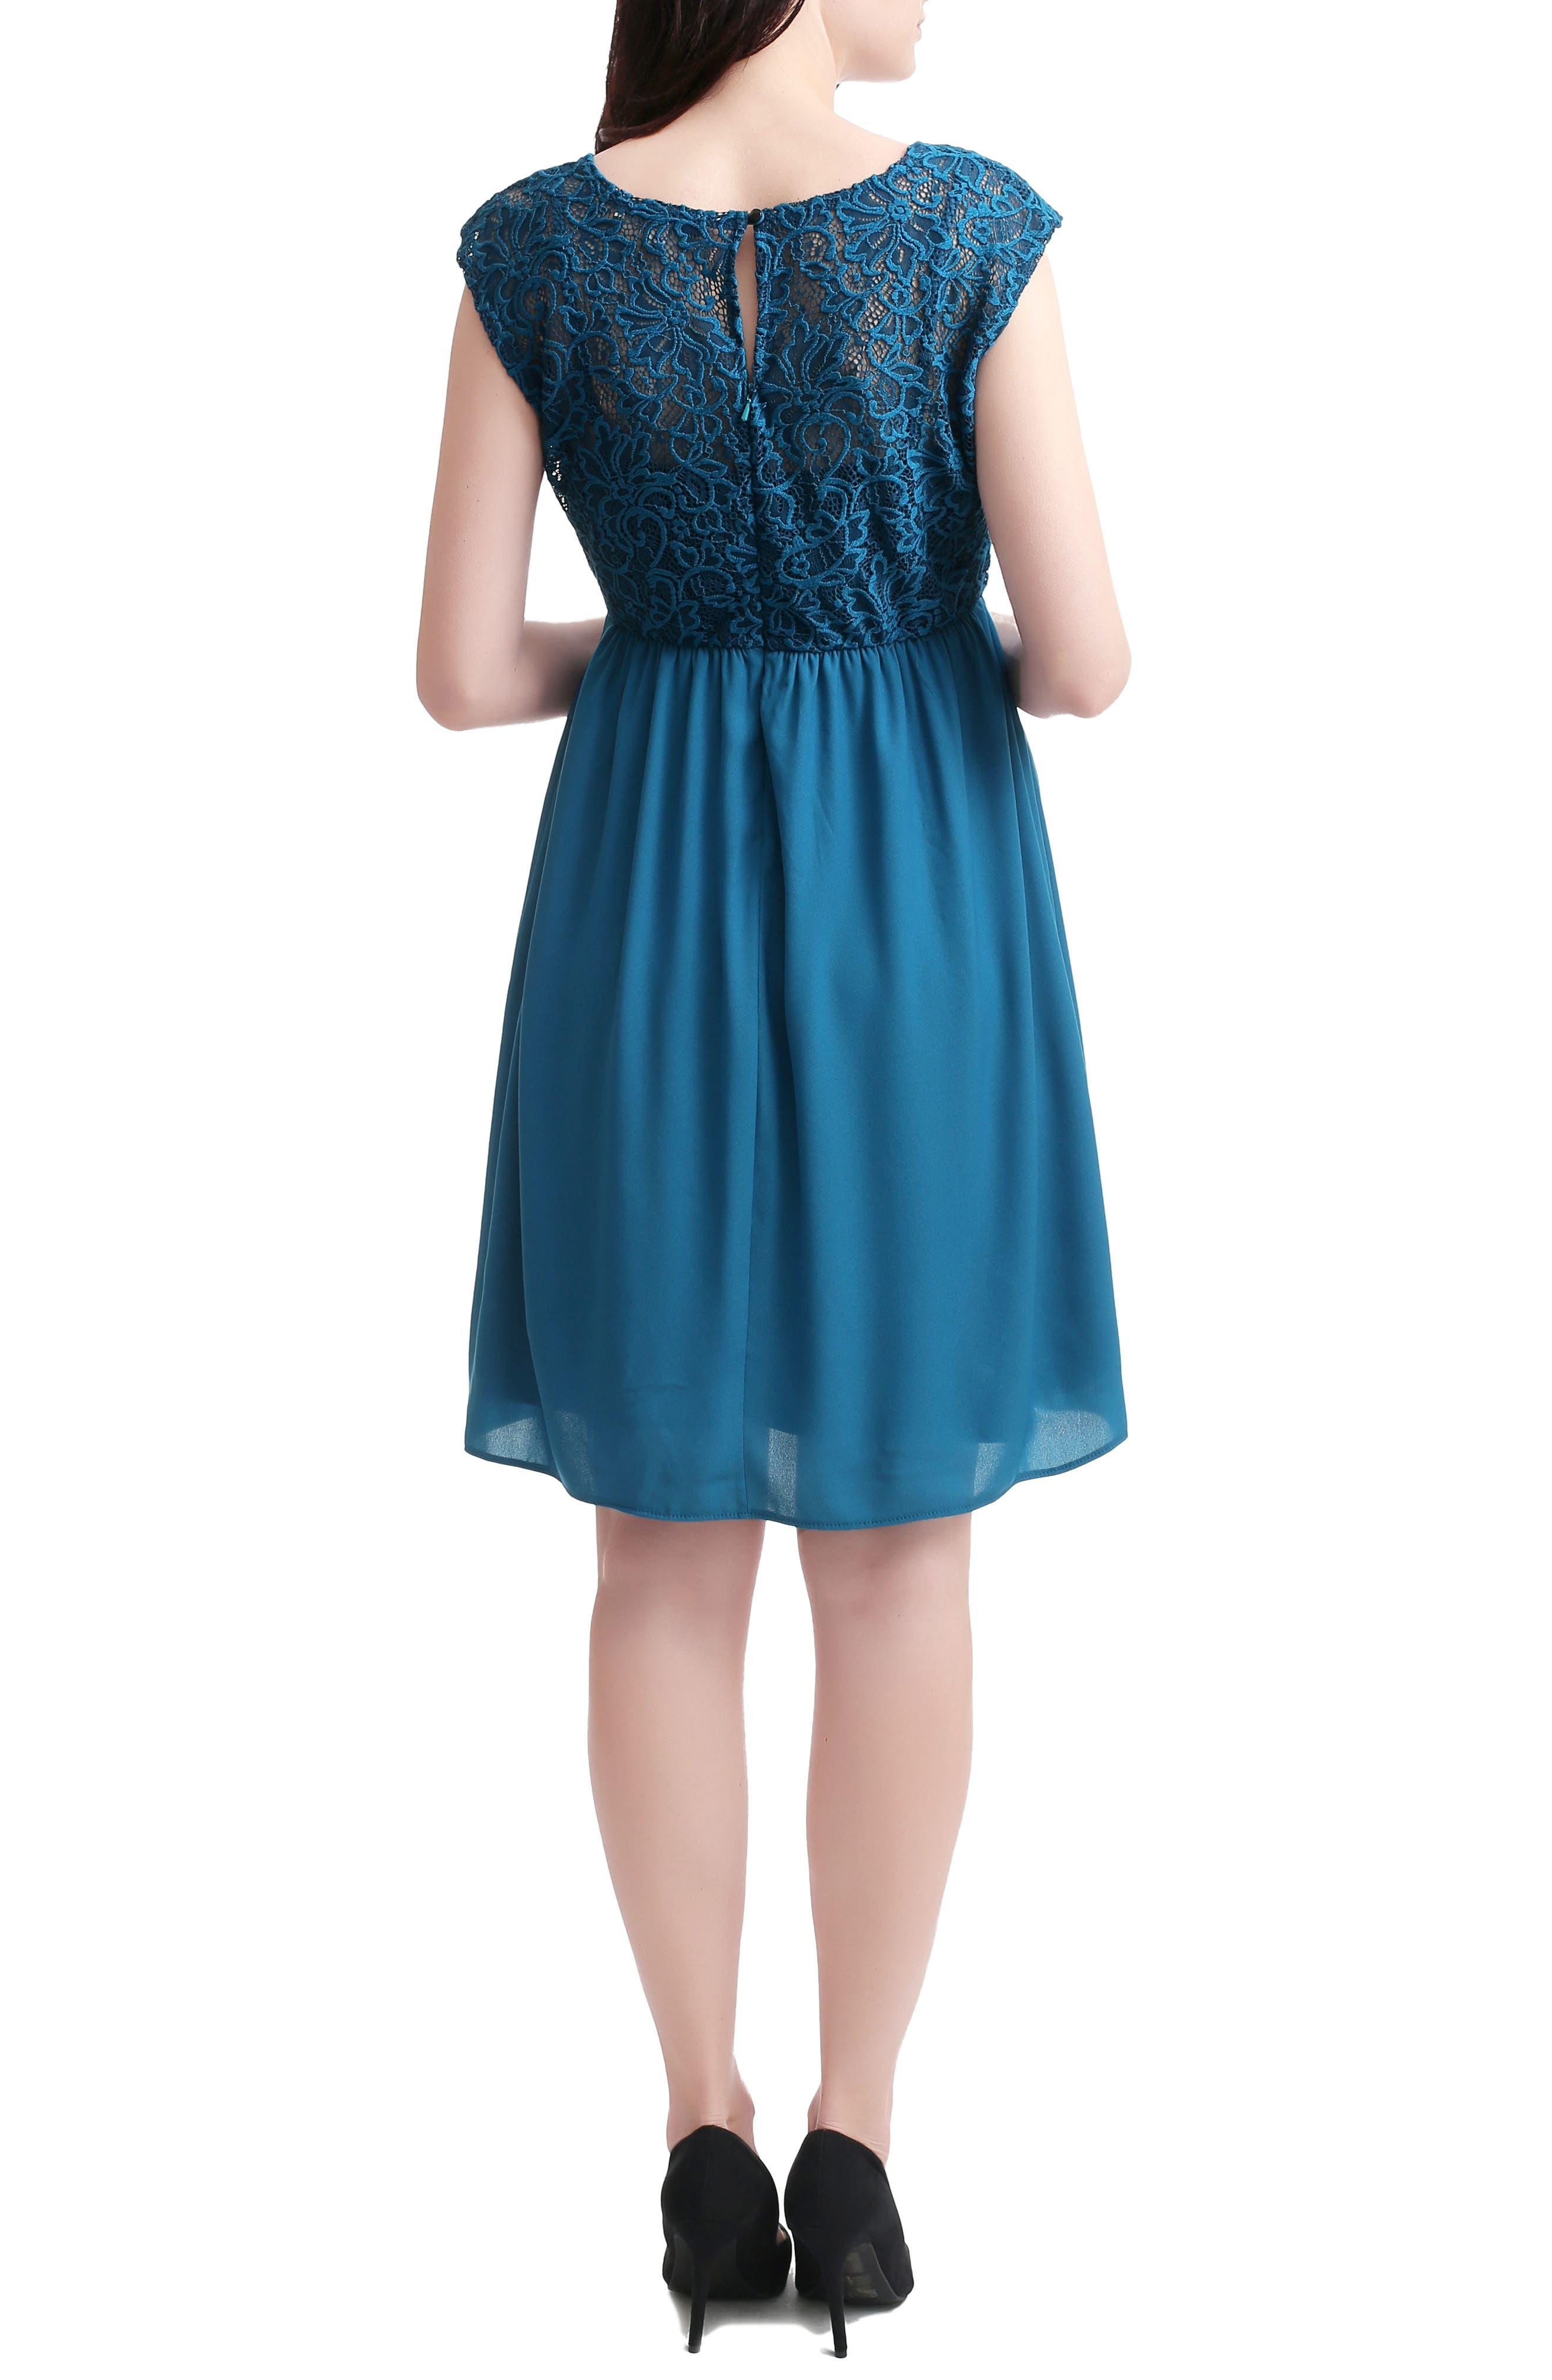 Kimi And Kai Genevieve Lace Maternity Dress, Blue/green